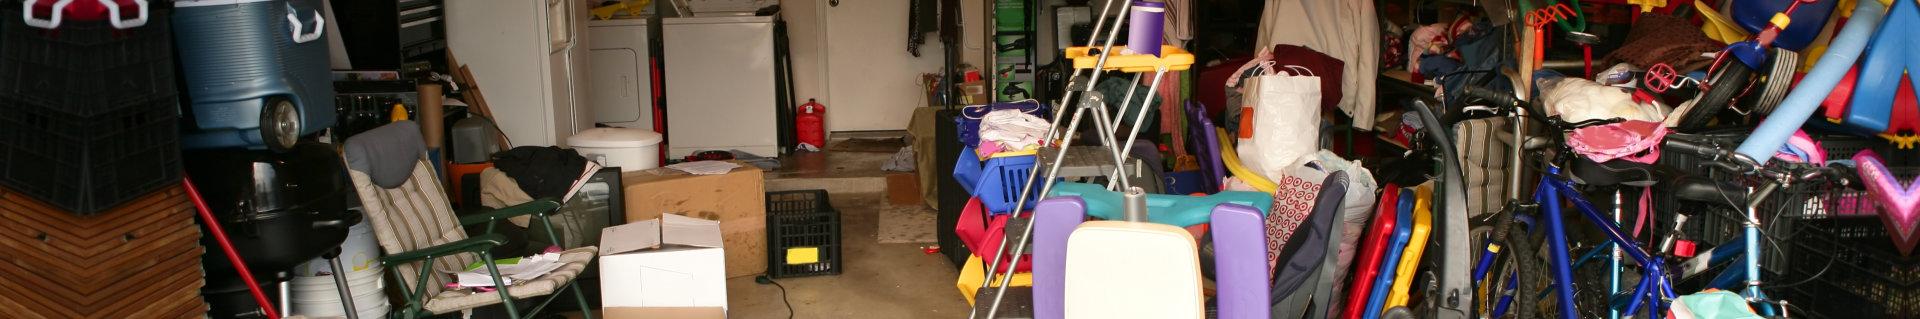 garage of junk items